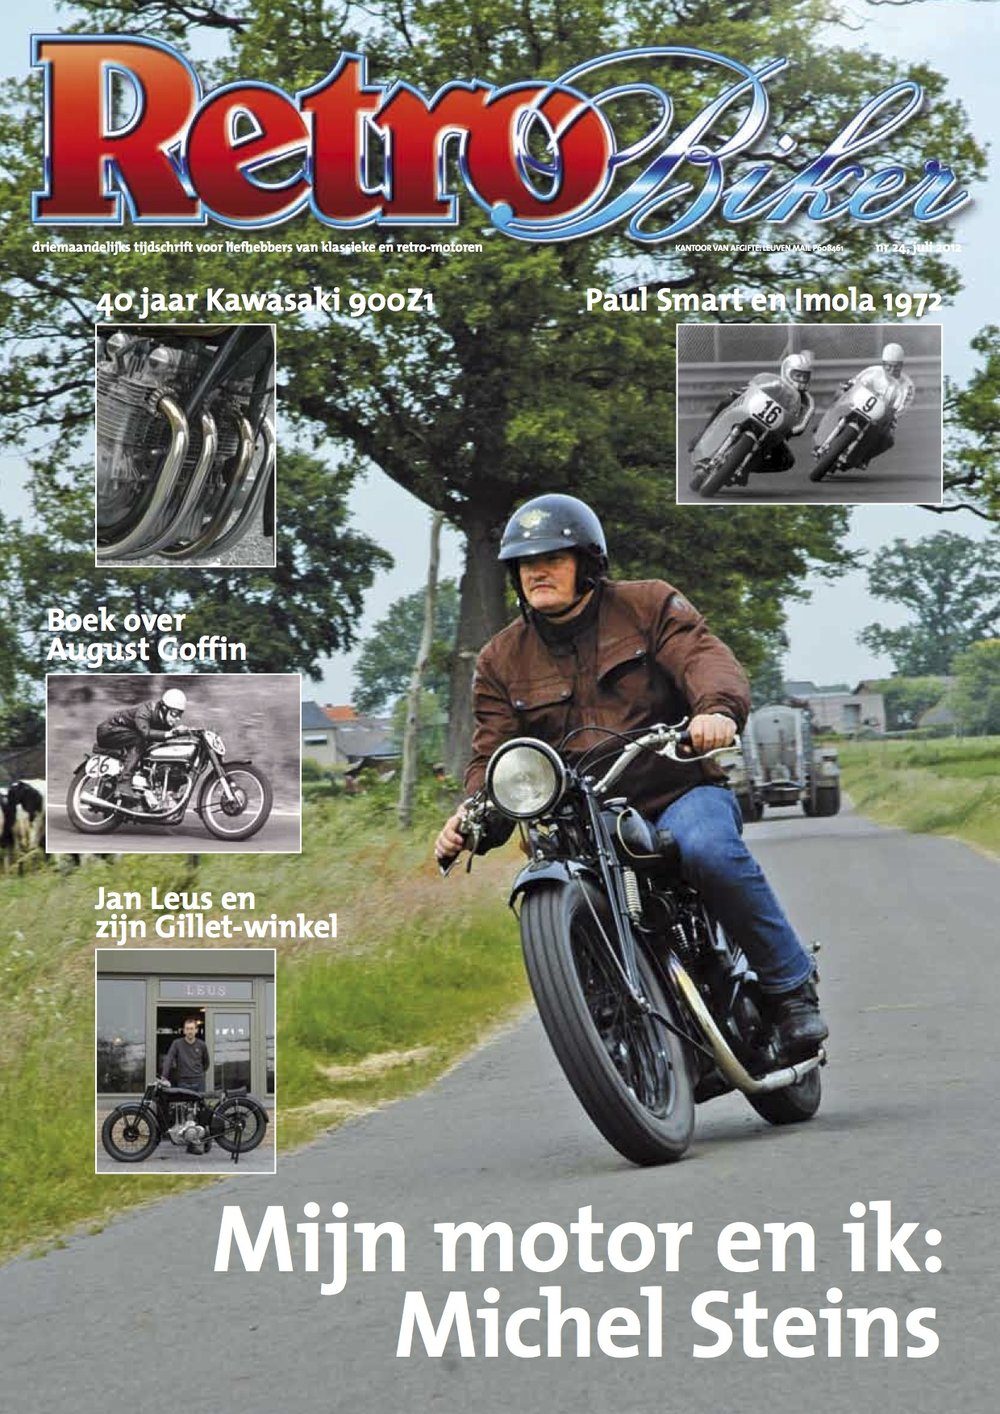 coverretrobiker-juli-2012.jpg